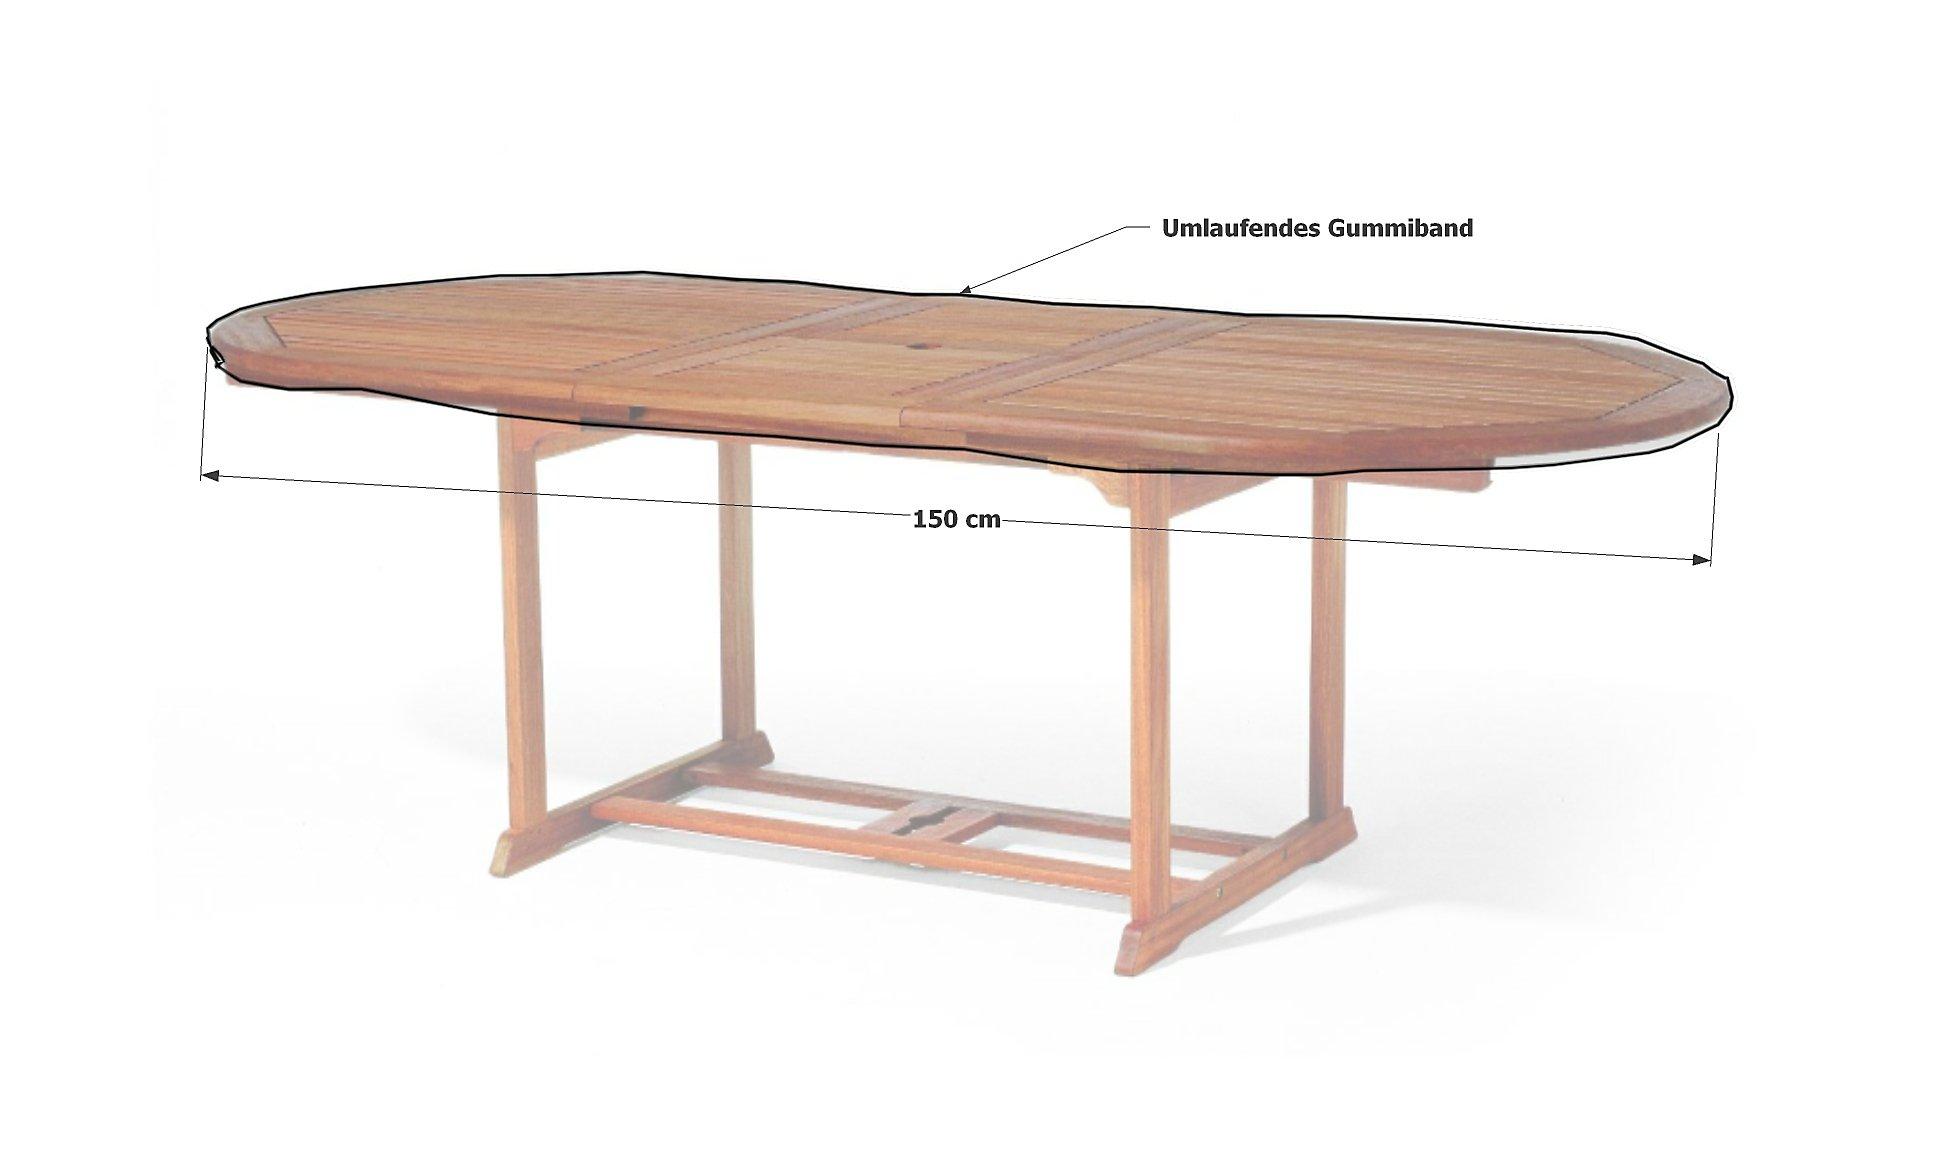 Grasekamp Gartentisch Tischplatten Abdeckung 150x90cm Oval Weiss